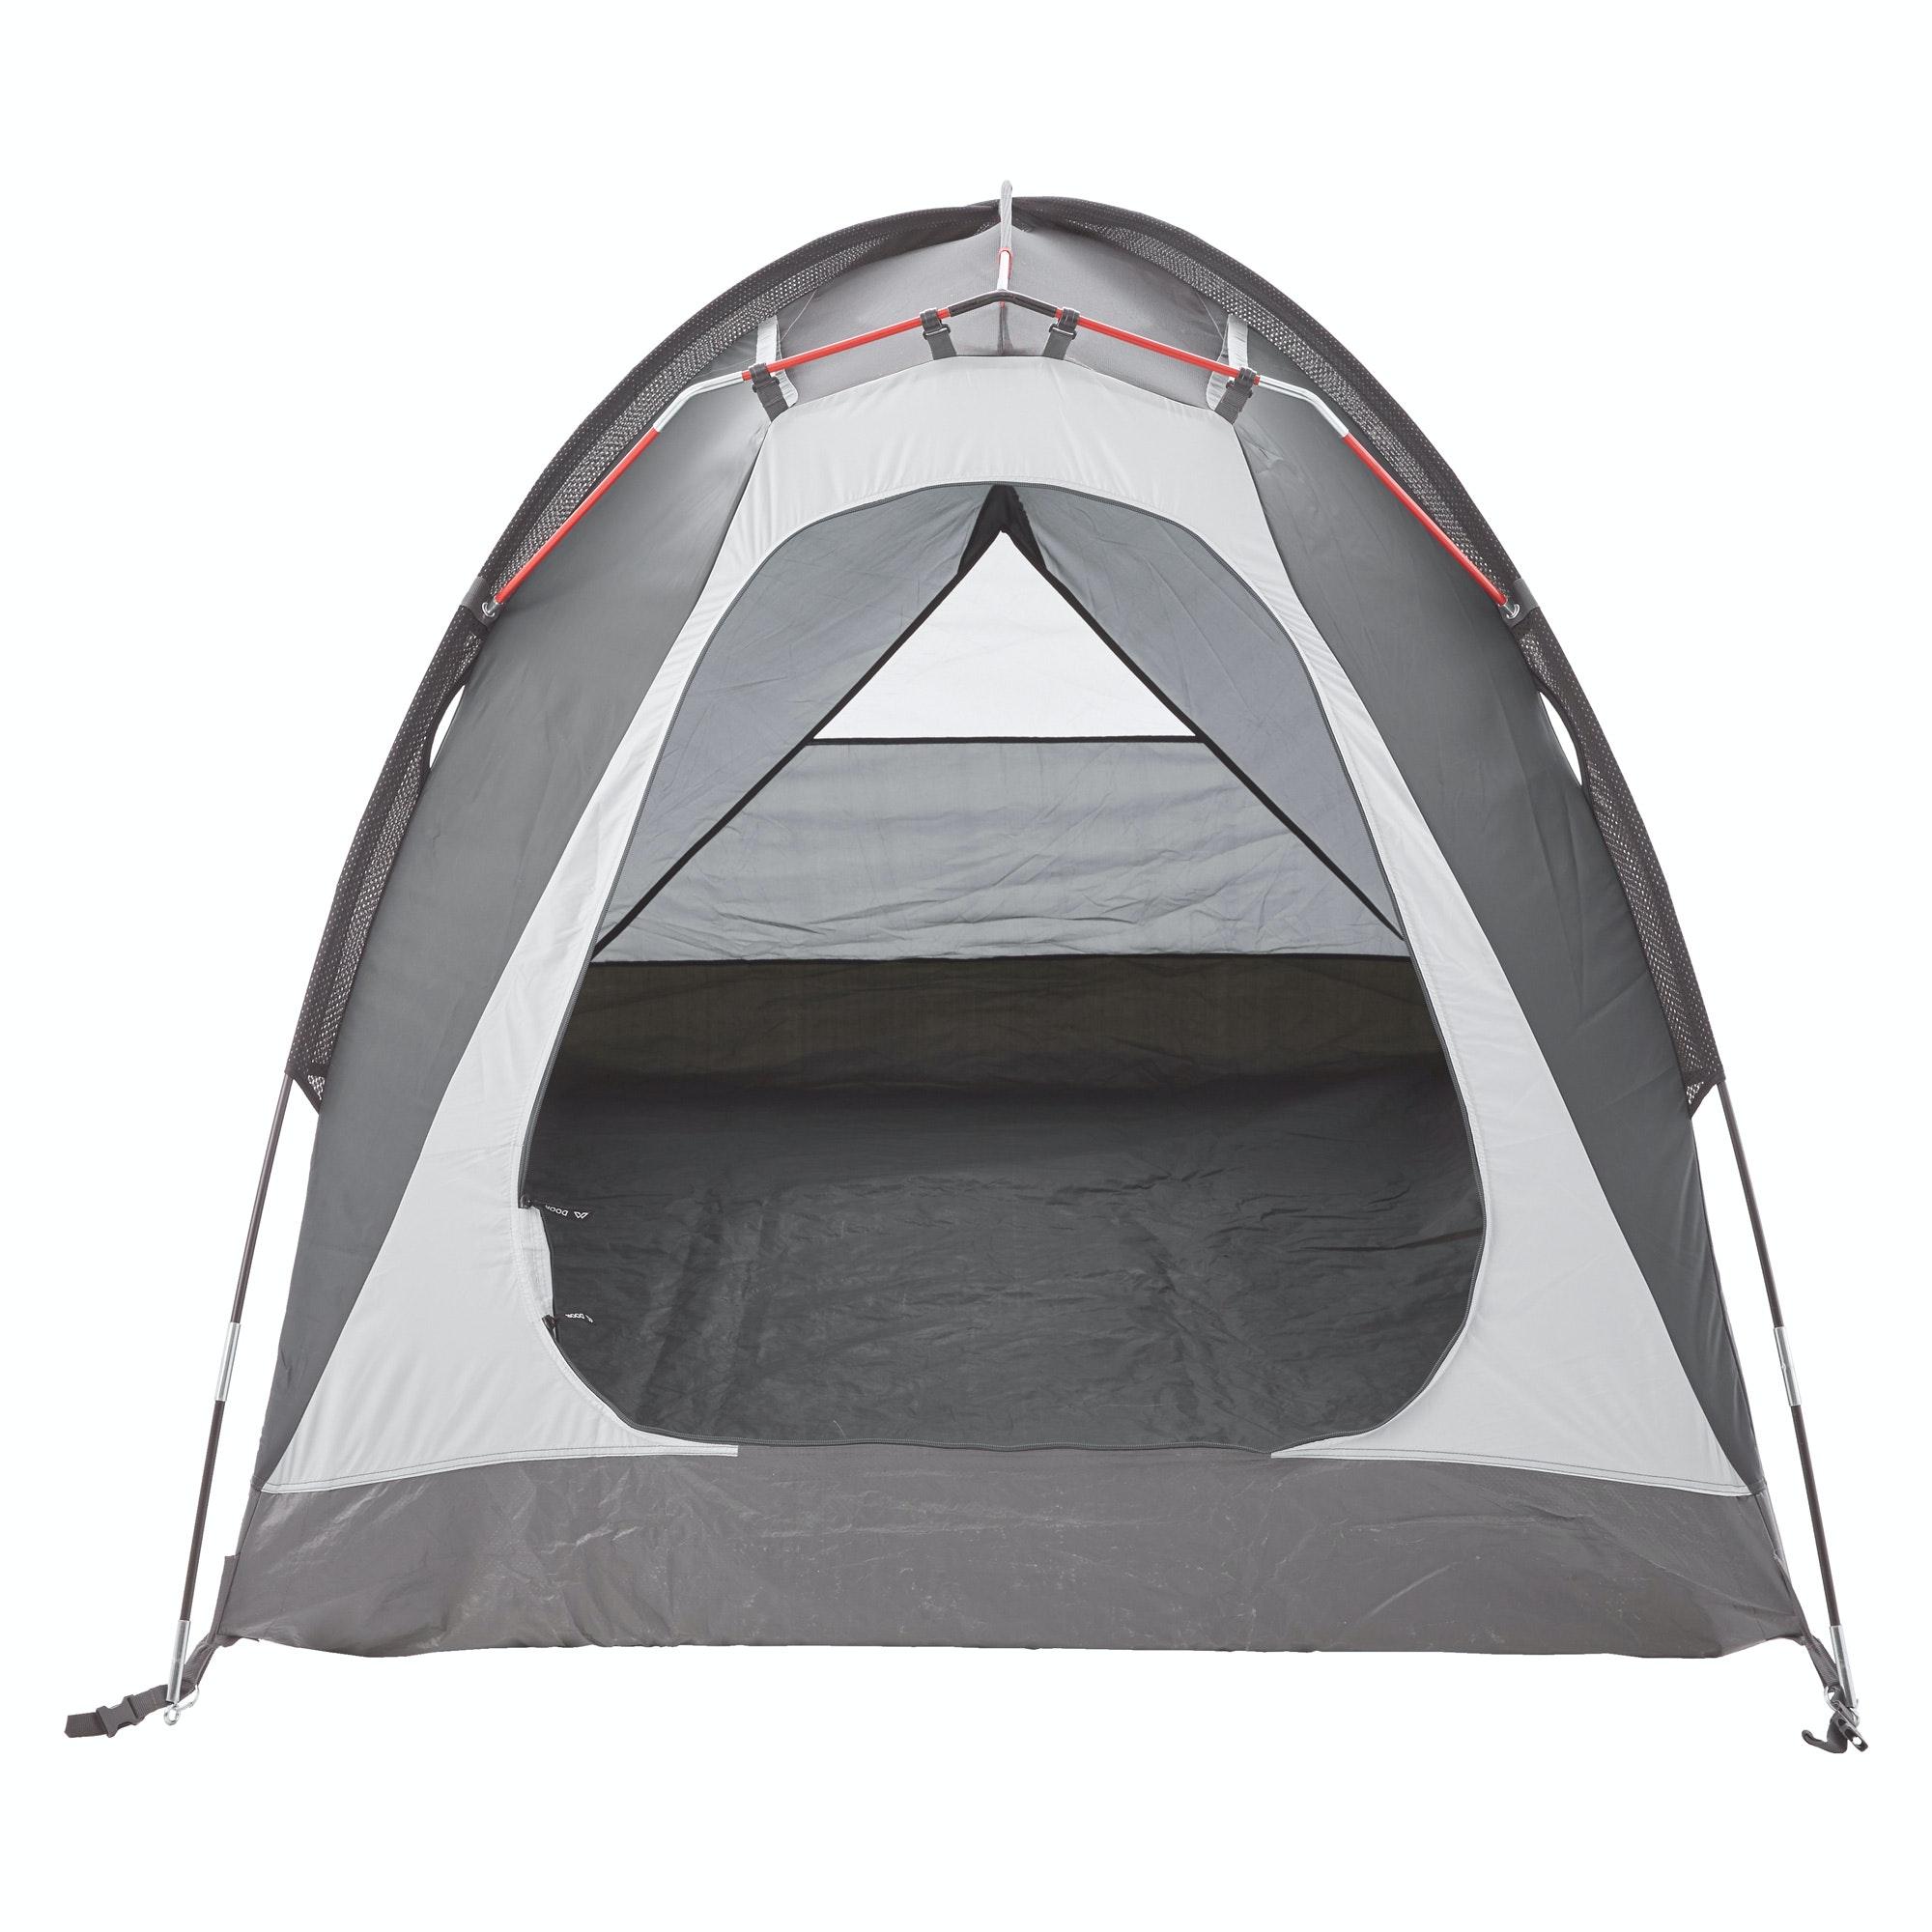 NEW-Kathmandu-Retreat-40-2-Person-Waterproof-Compact-Camping-Hiking-Tent